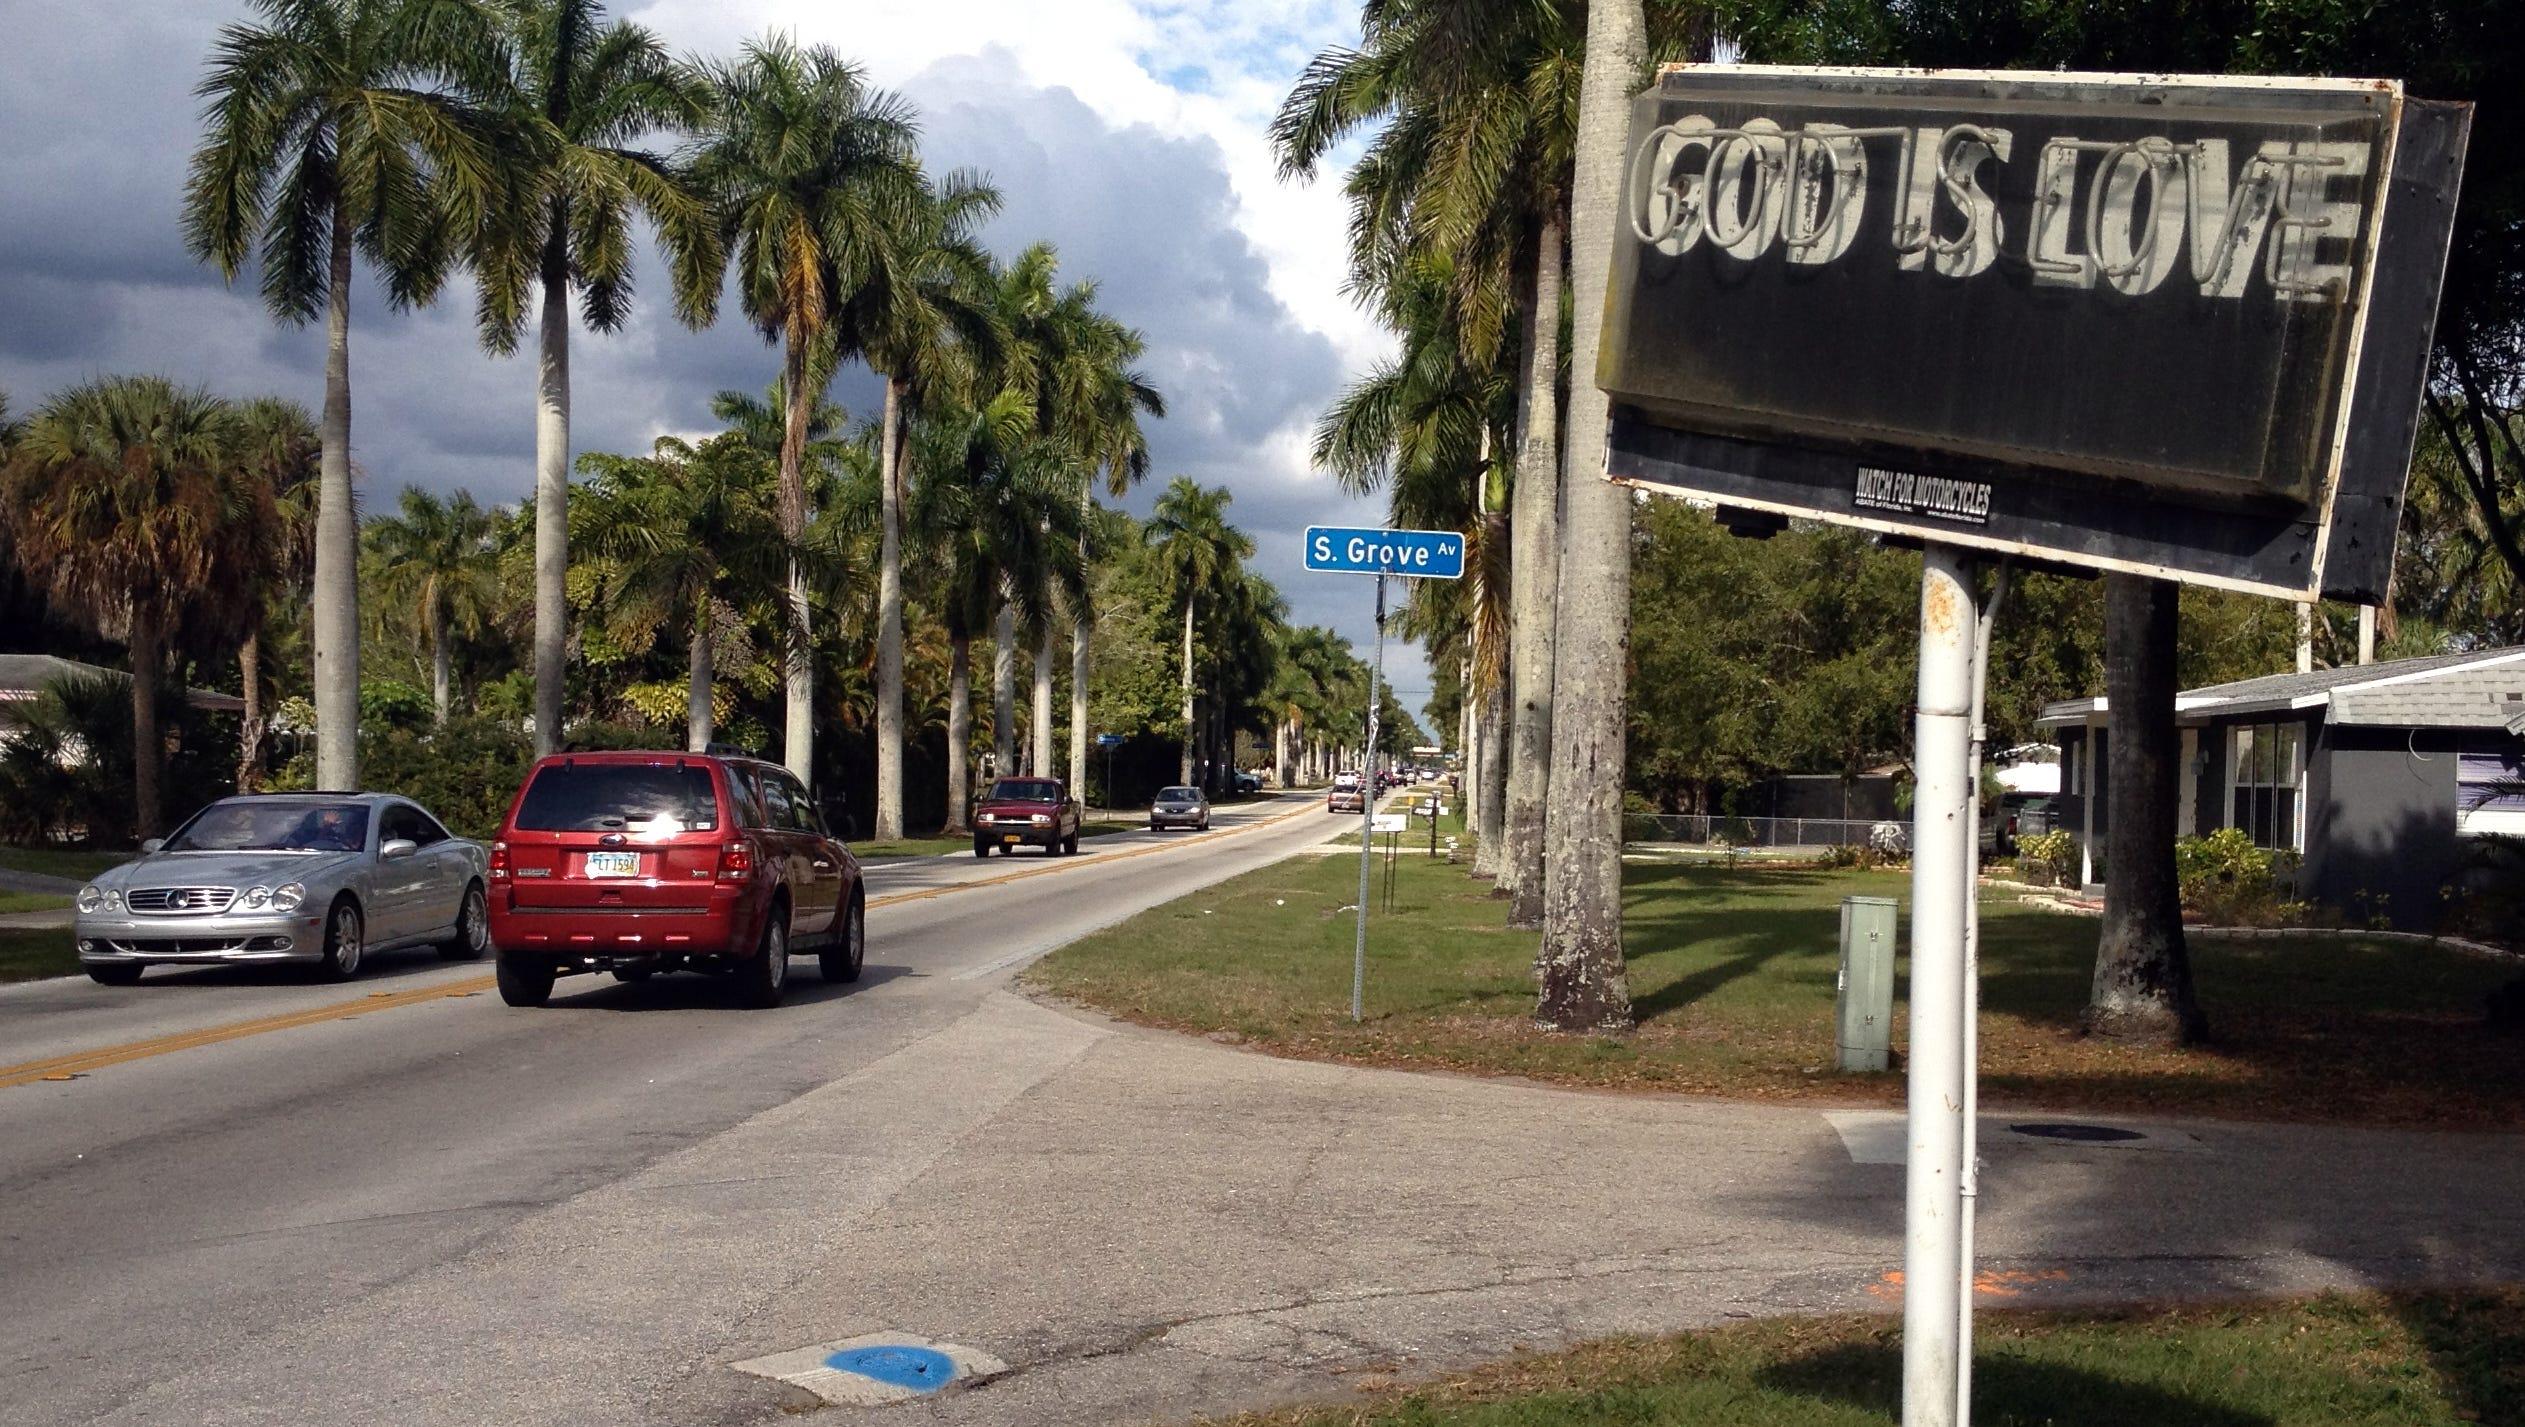 God Is Love sign on McGregor Boulevard in Fort Myers.